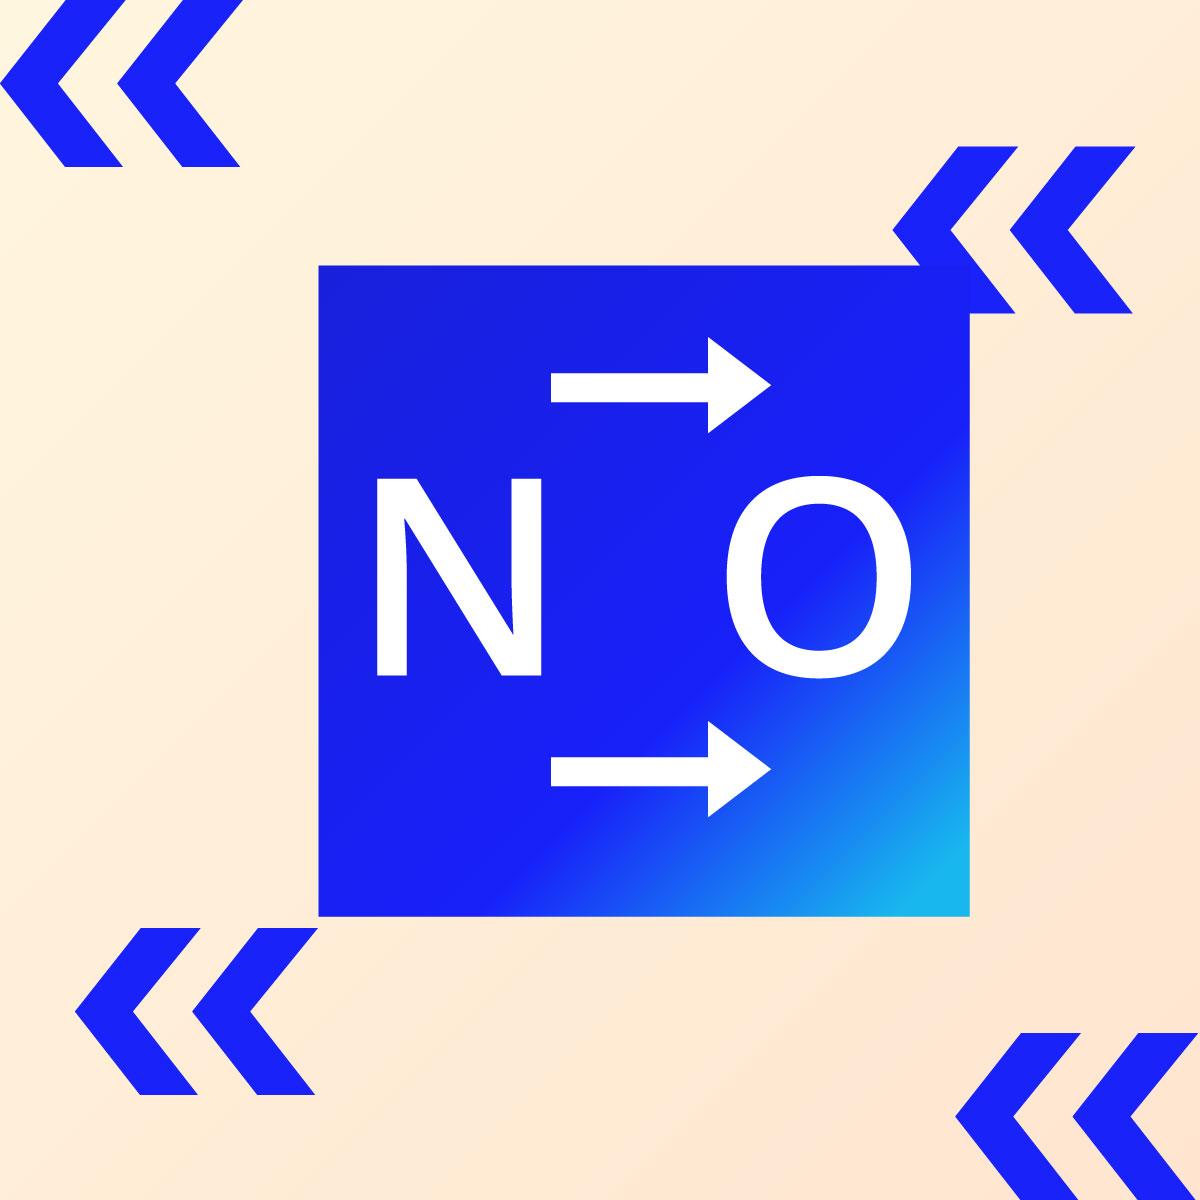 010-NO.jpg